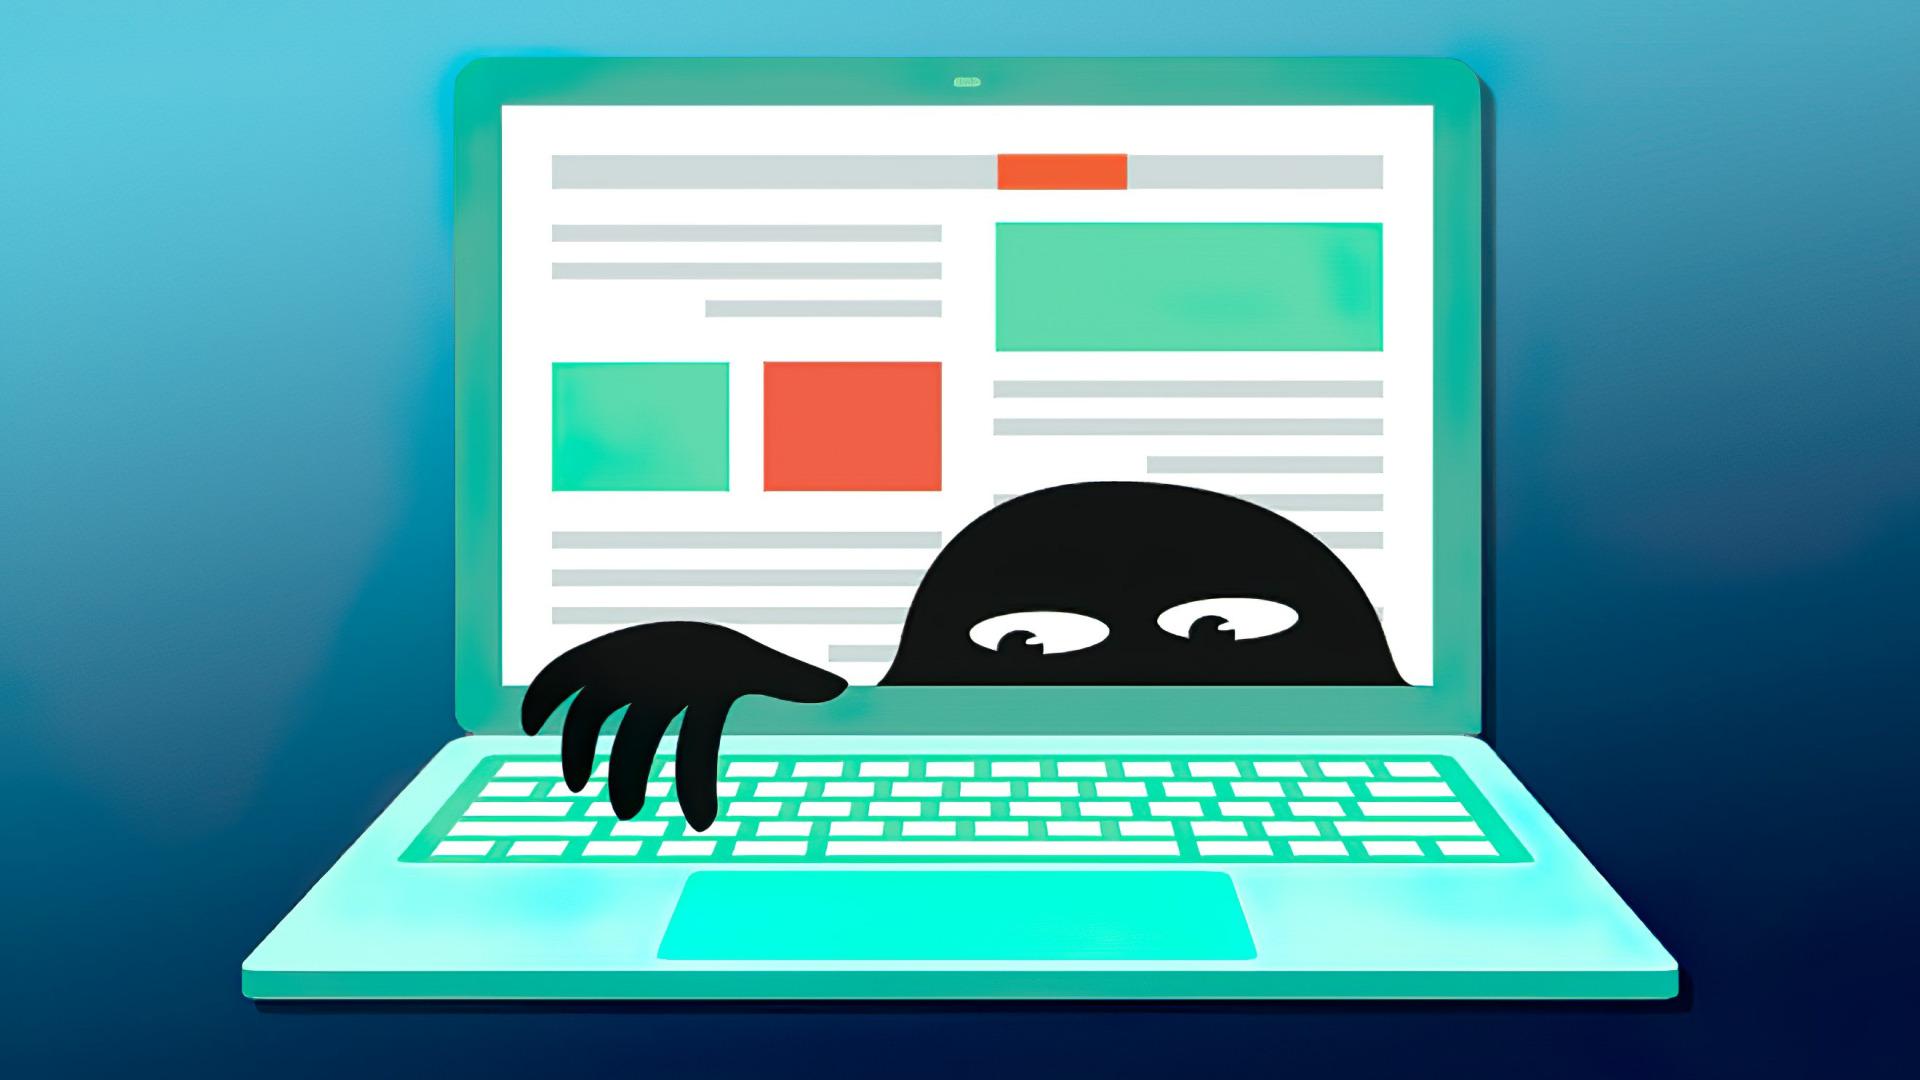 Sicherheit, Sicherheitslücke, Leak, Hacker, Security, Malware, Hack, Angriff, Bug, Virus, Trojaner, Kriminalität, Schadsoftware, Exploit, Cybercrime, Cybersecurity, Hacking, Ransomware, Spam, Hackerangriff, Erpressung, Internetkriminalität, Phishing, Ddos, Warnung, Darknet, Hacken, Hacker Angriffe, Hacker Angriff, Attack, Ransom, Hacks, Viren, Gehackt, Crime, Schädling, China Hacker, Russische Hacker, Adware, Security Report, Error, Malware Warnung, Security Bulletin, Promi-Hacker, Android Malware, Phisher, Secure, Breaking